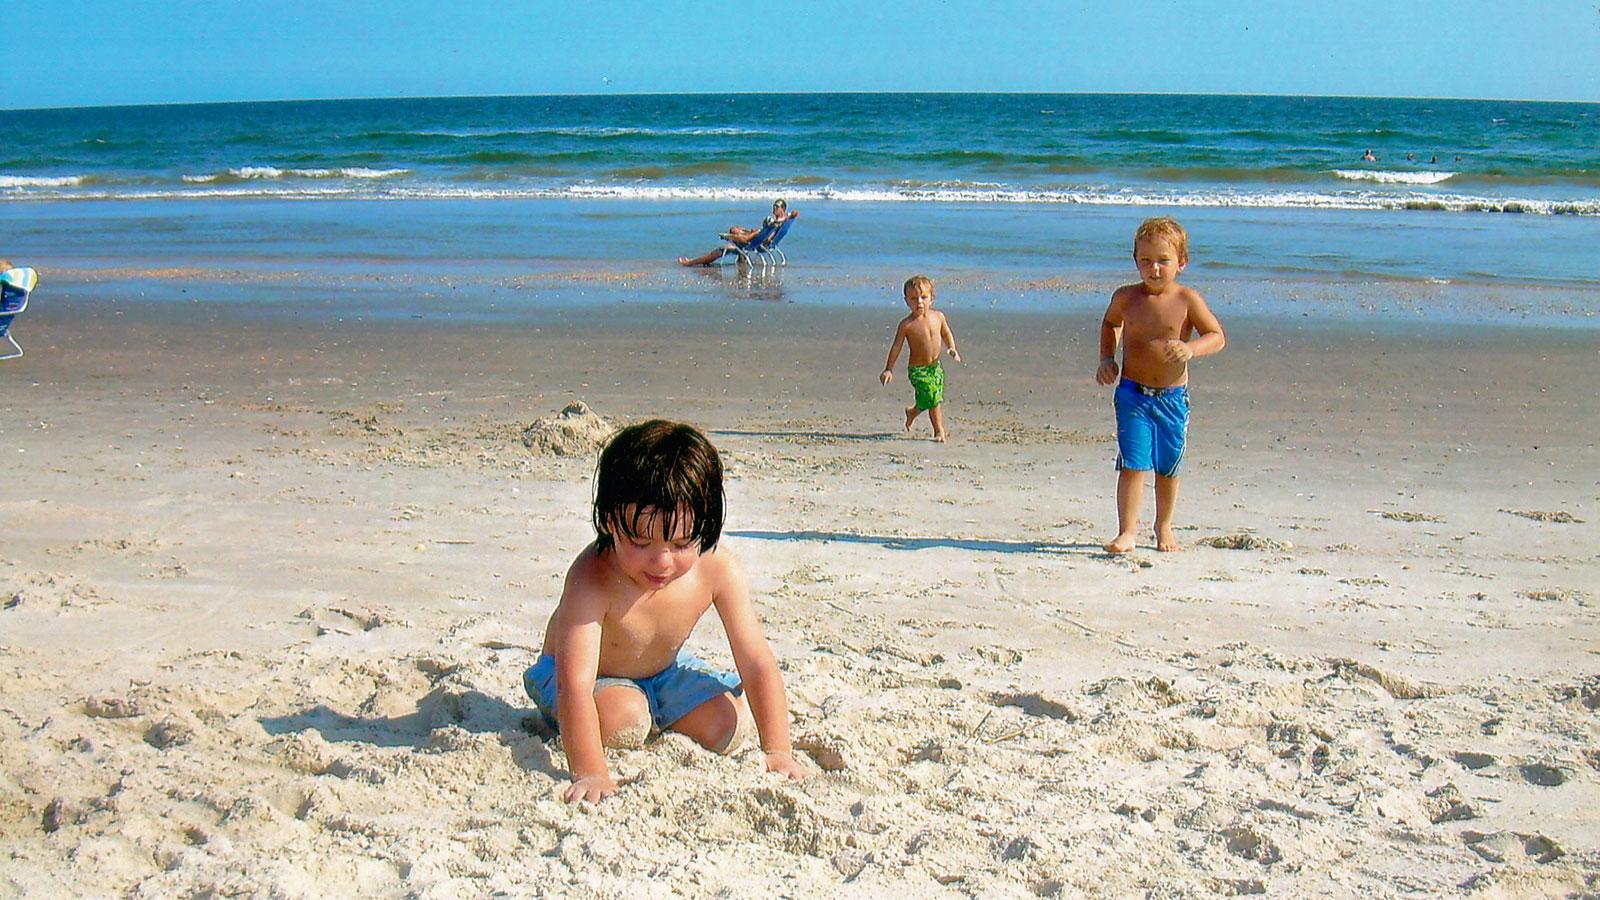 Ocean Isle Beach Vacation Rentals   The #1 Vacation Rentals